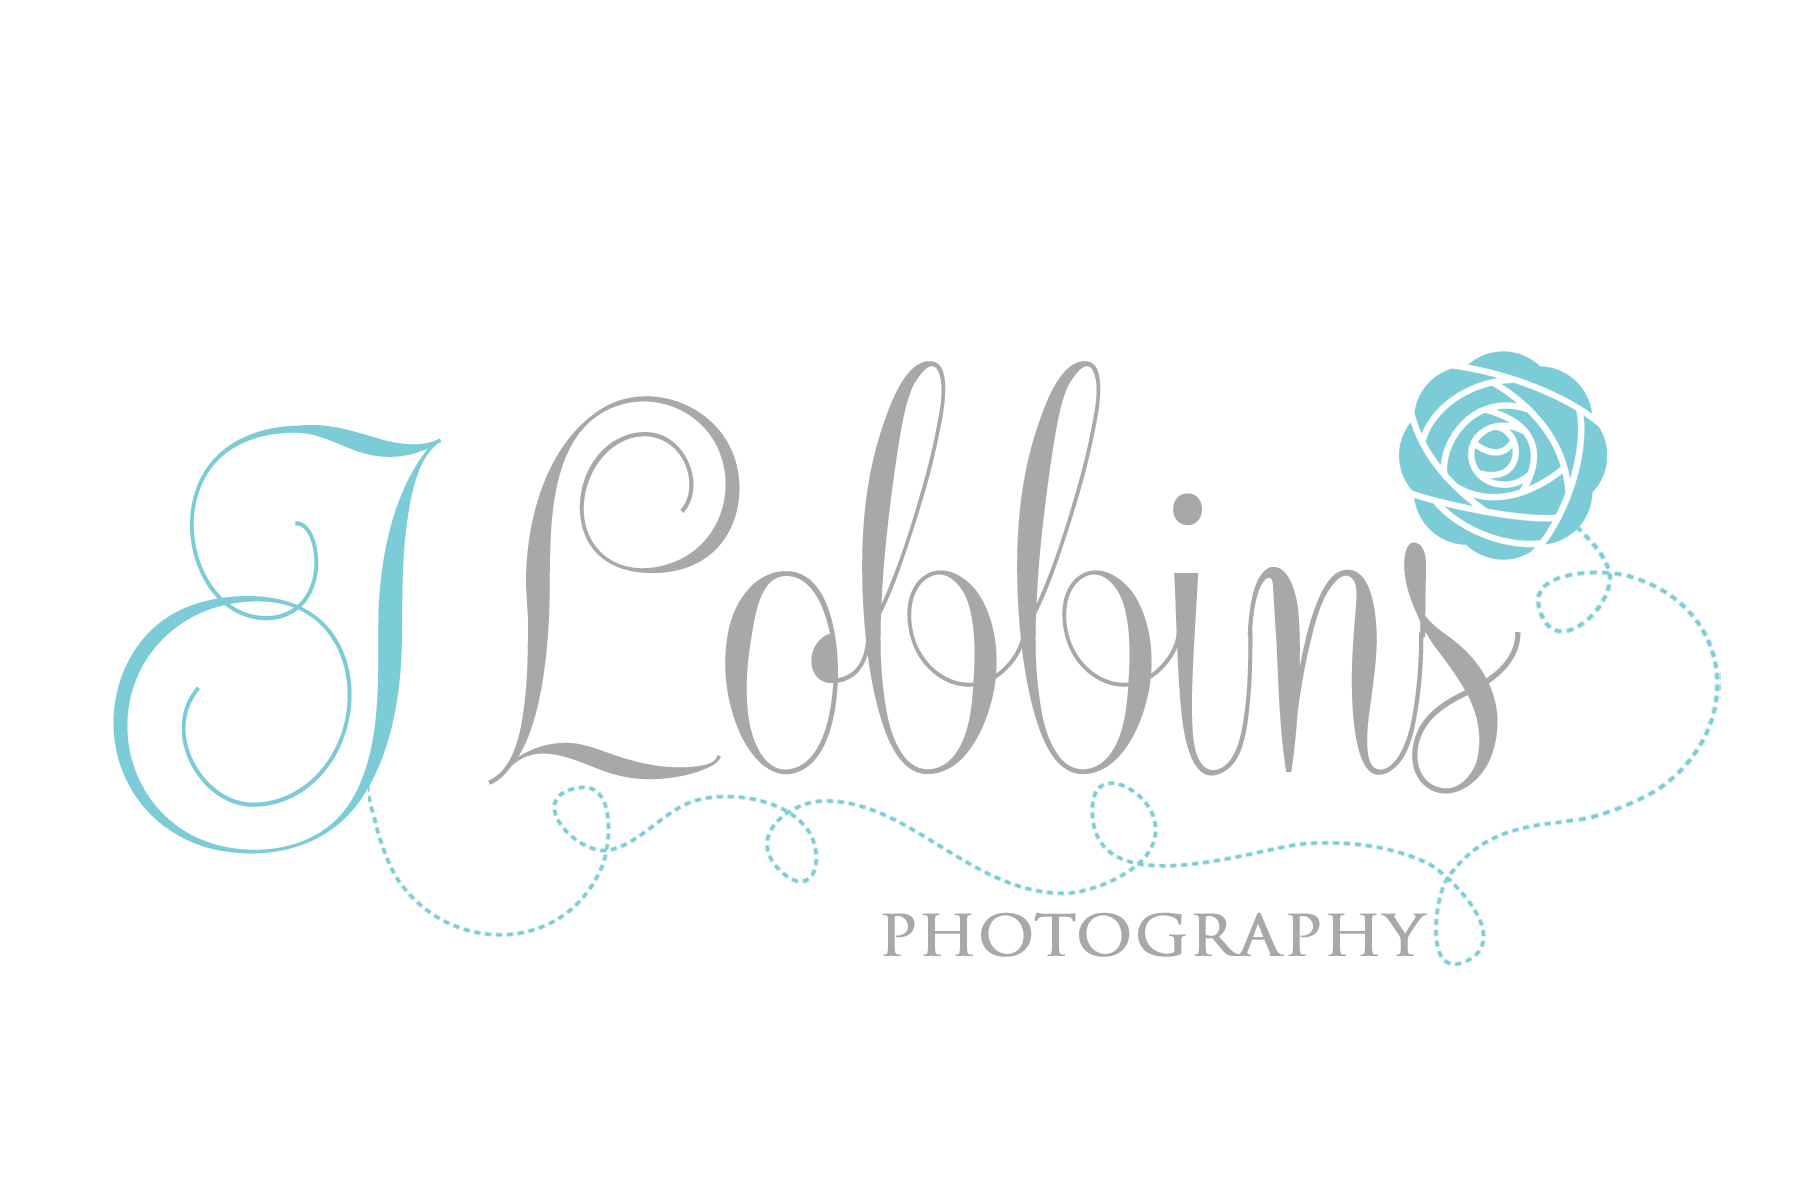 J Lobbins Photography